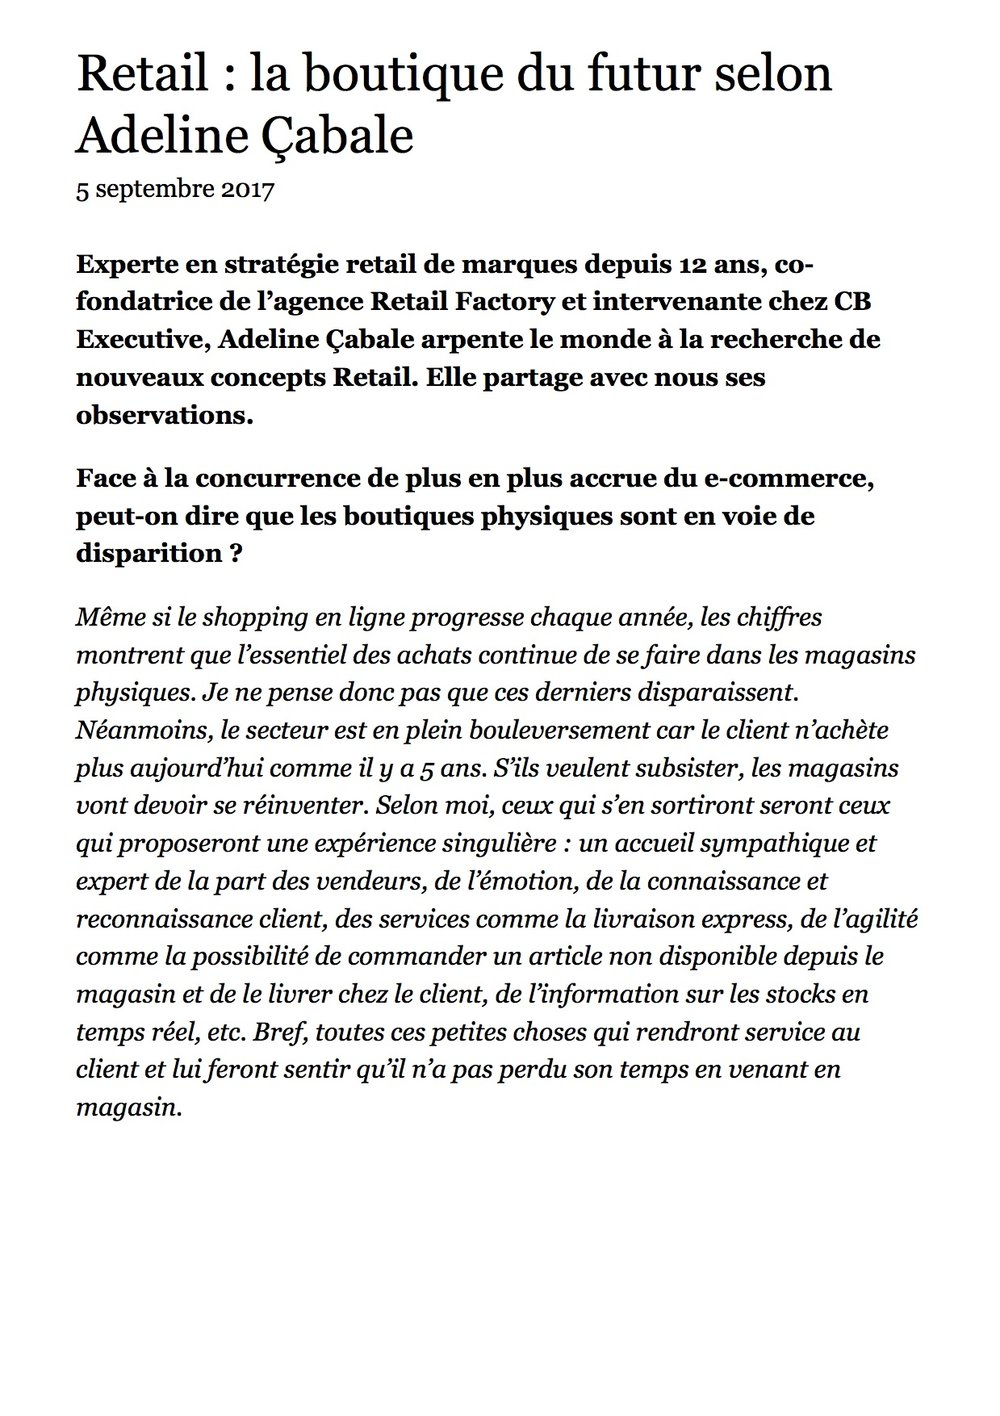 article Adeline Çabale.jpg